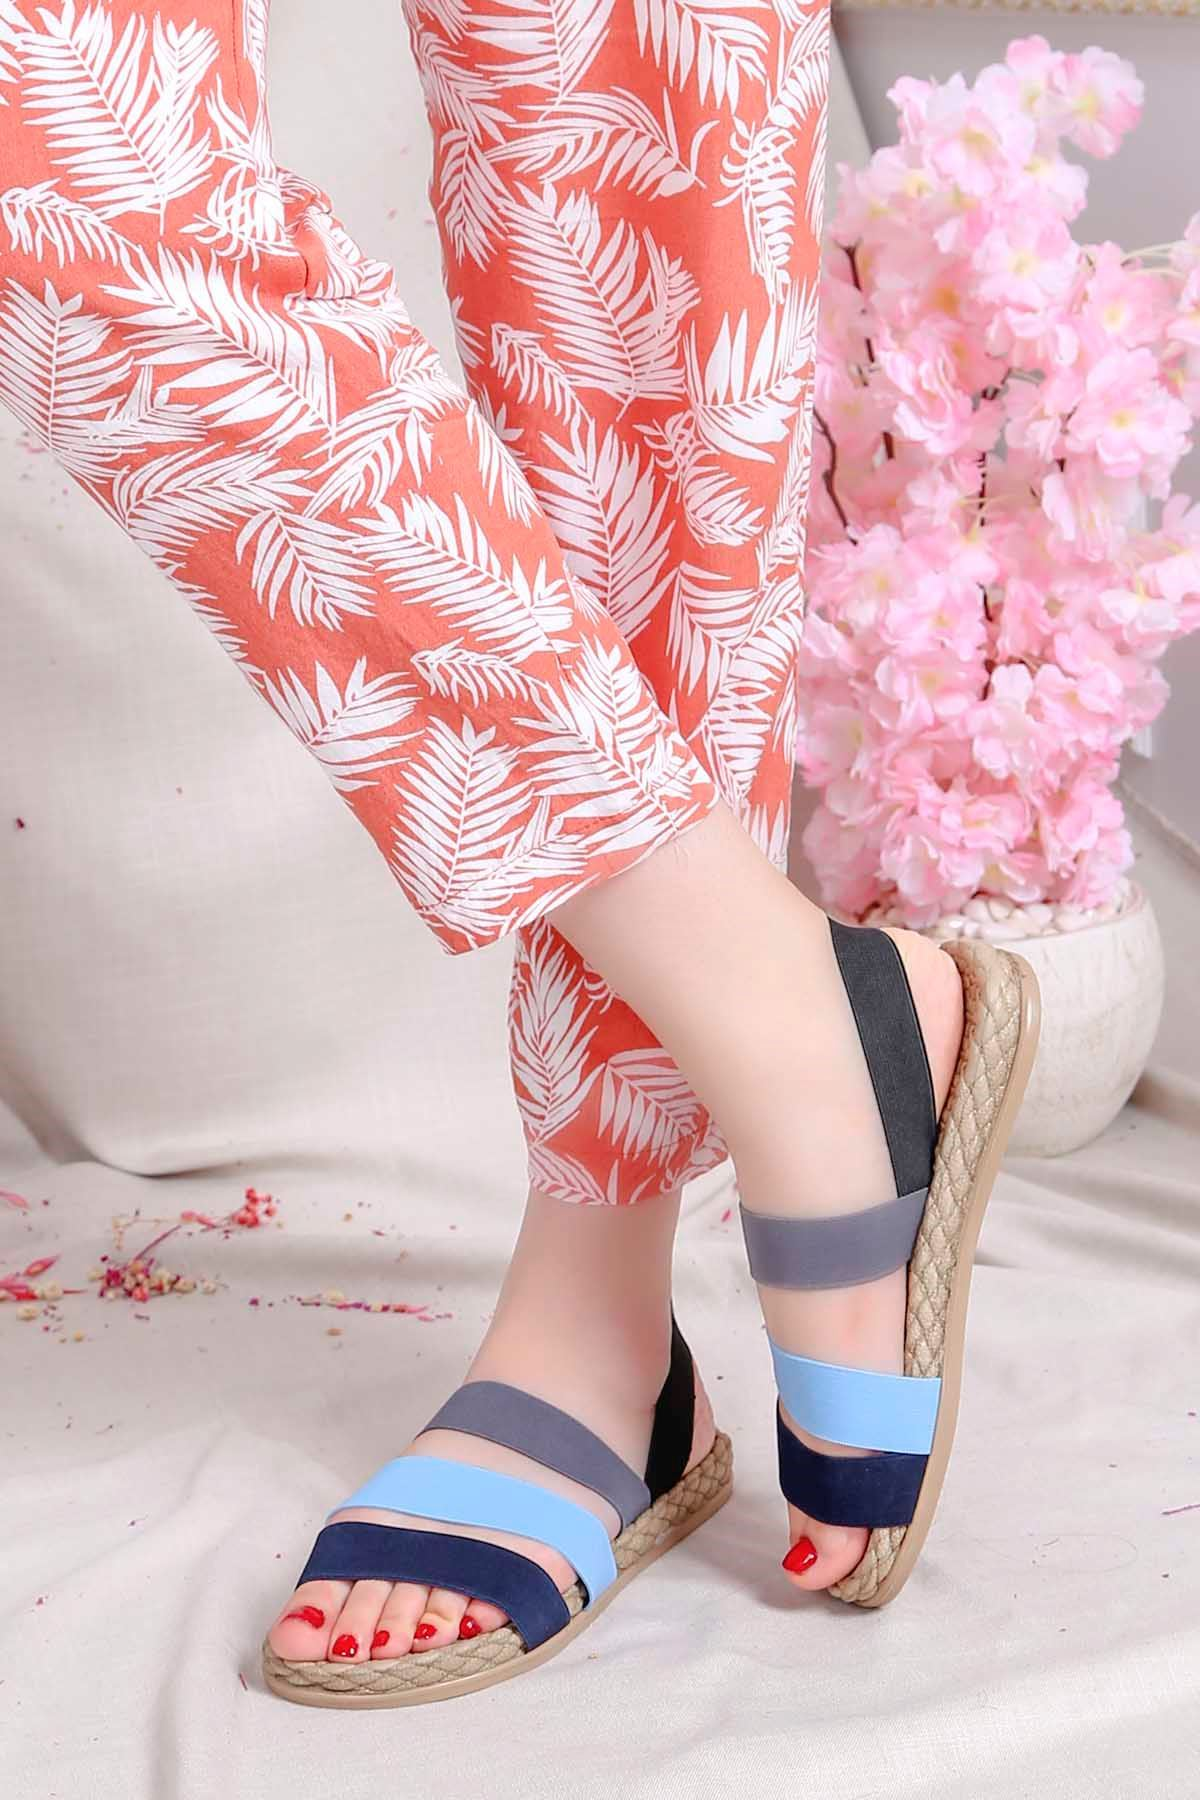 Brk-2020 Lastikli Sandalet Mavi Lacivert Gri